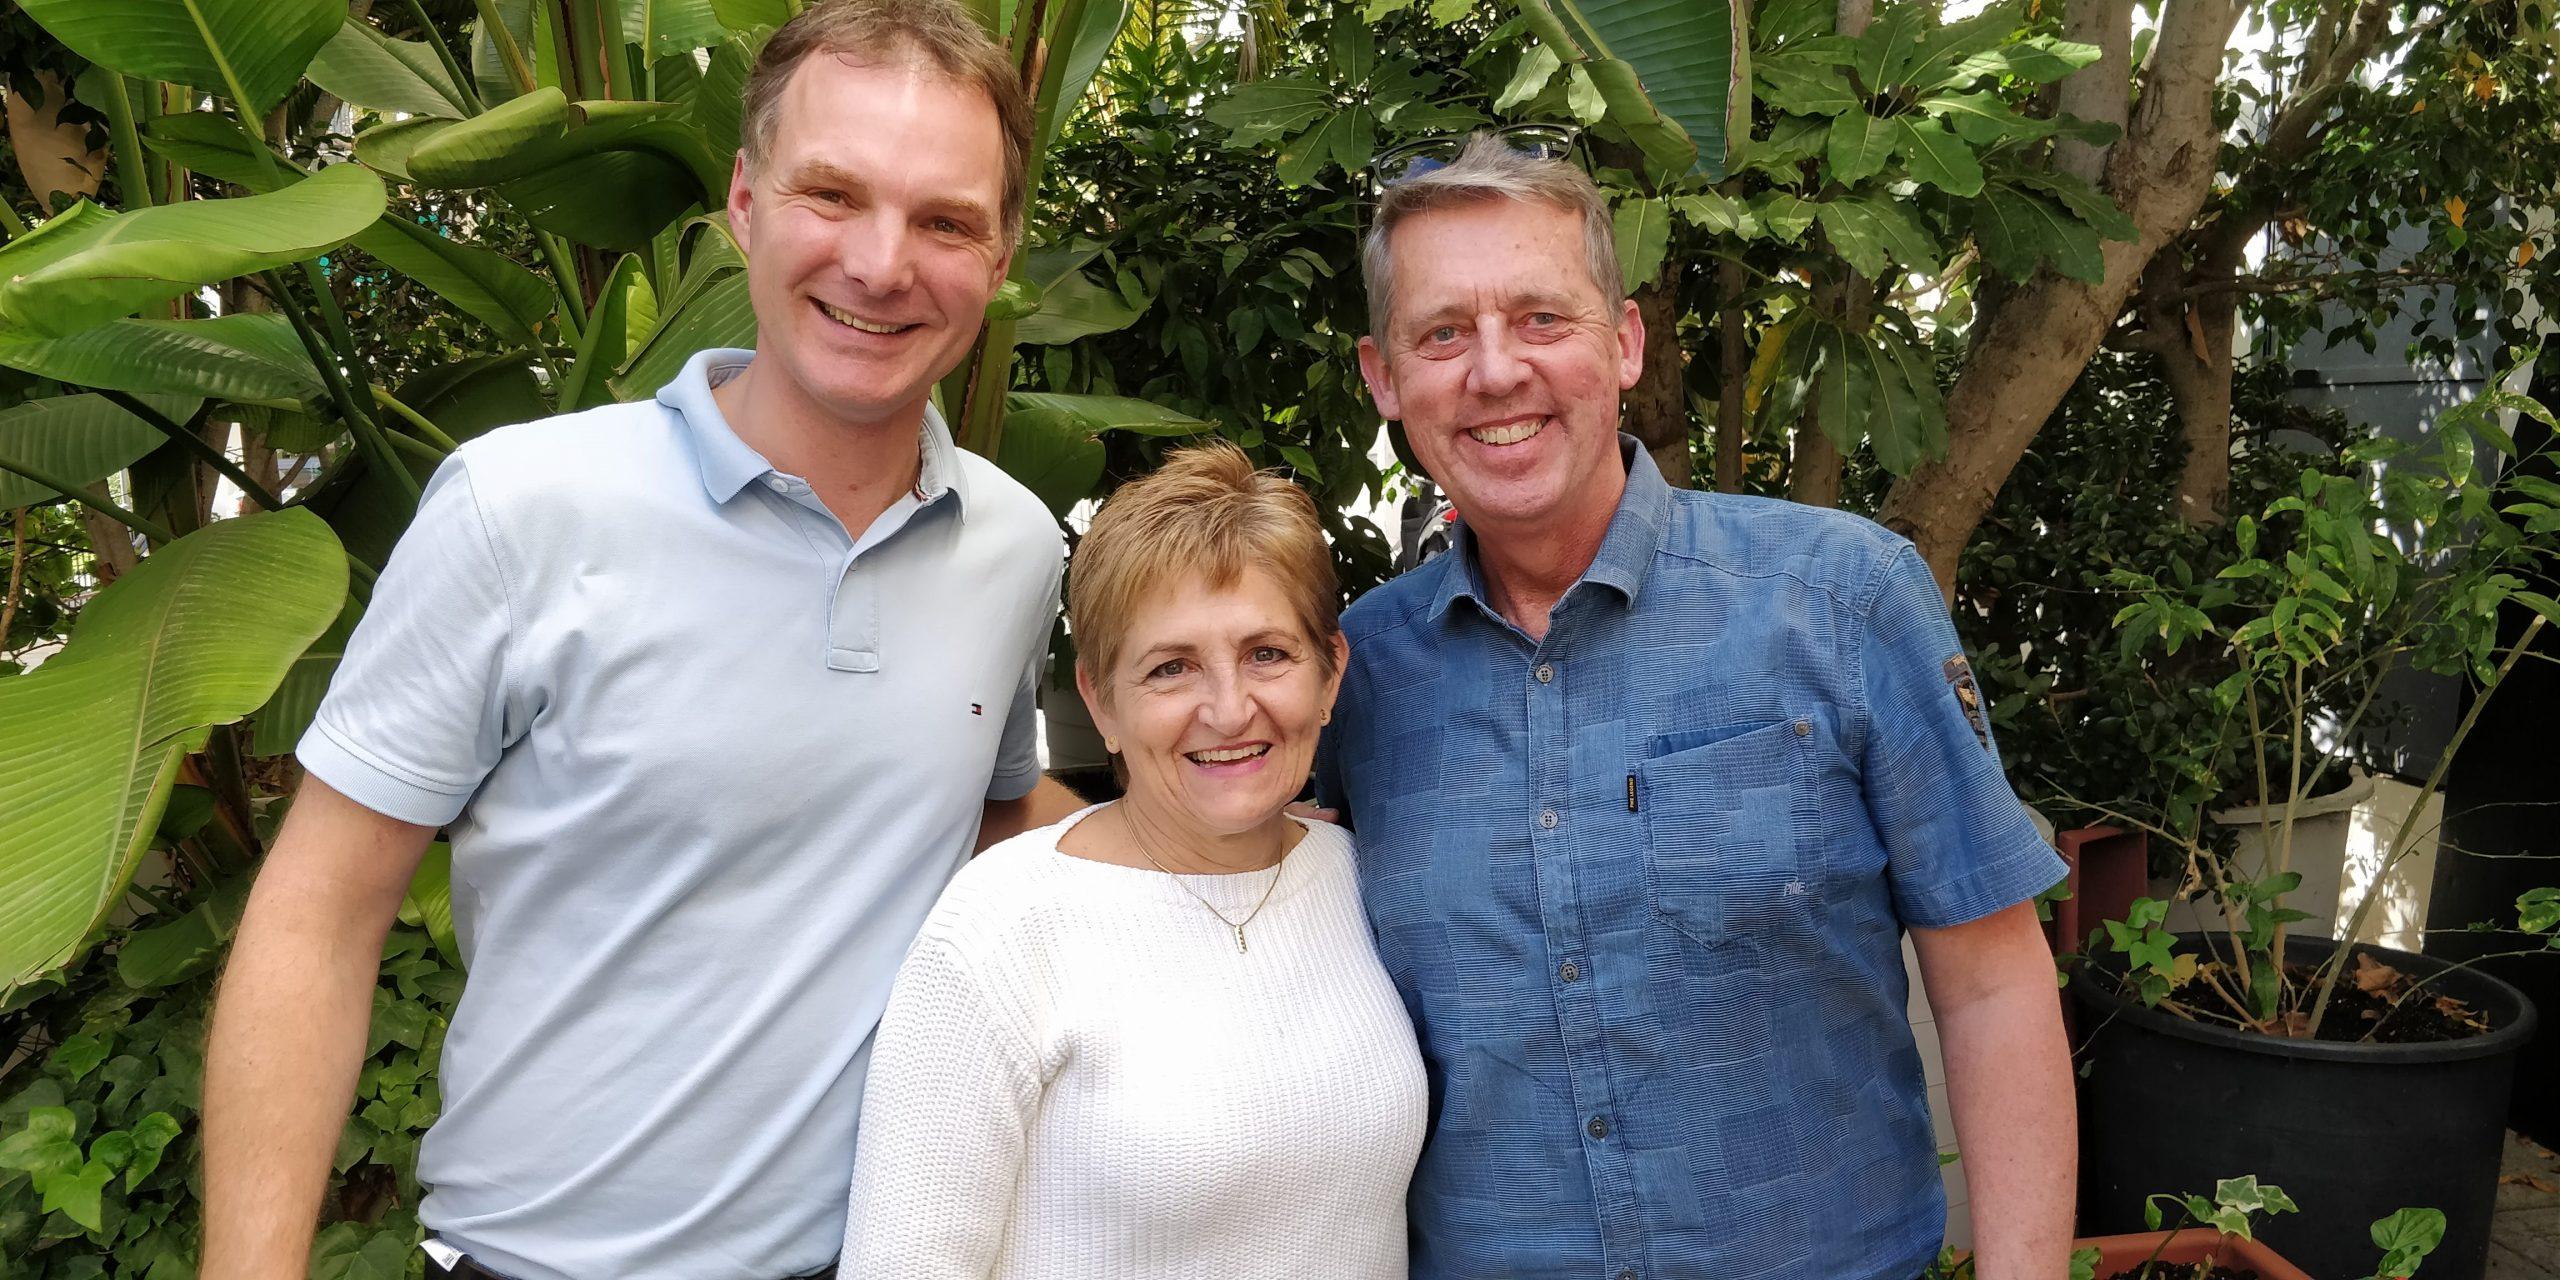 Orthopaedic Surgery Team at Bodyworks Clinic Marbella